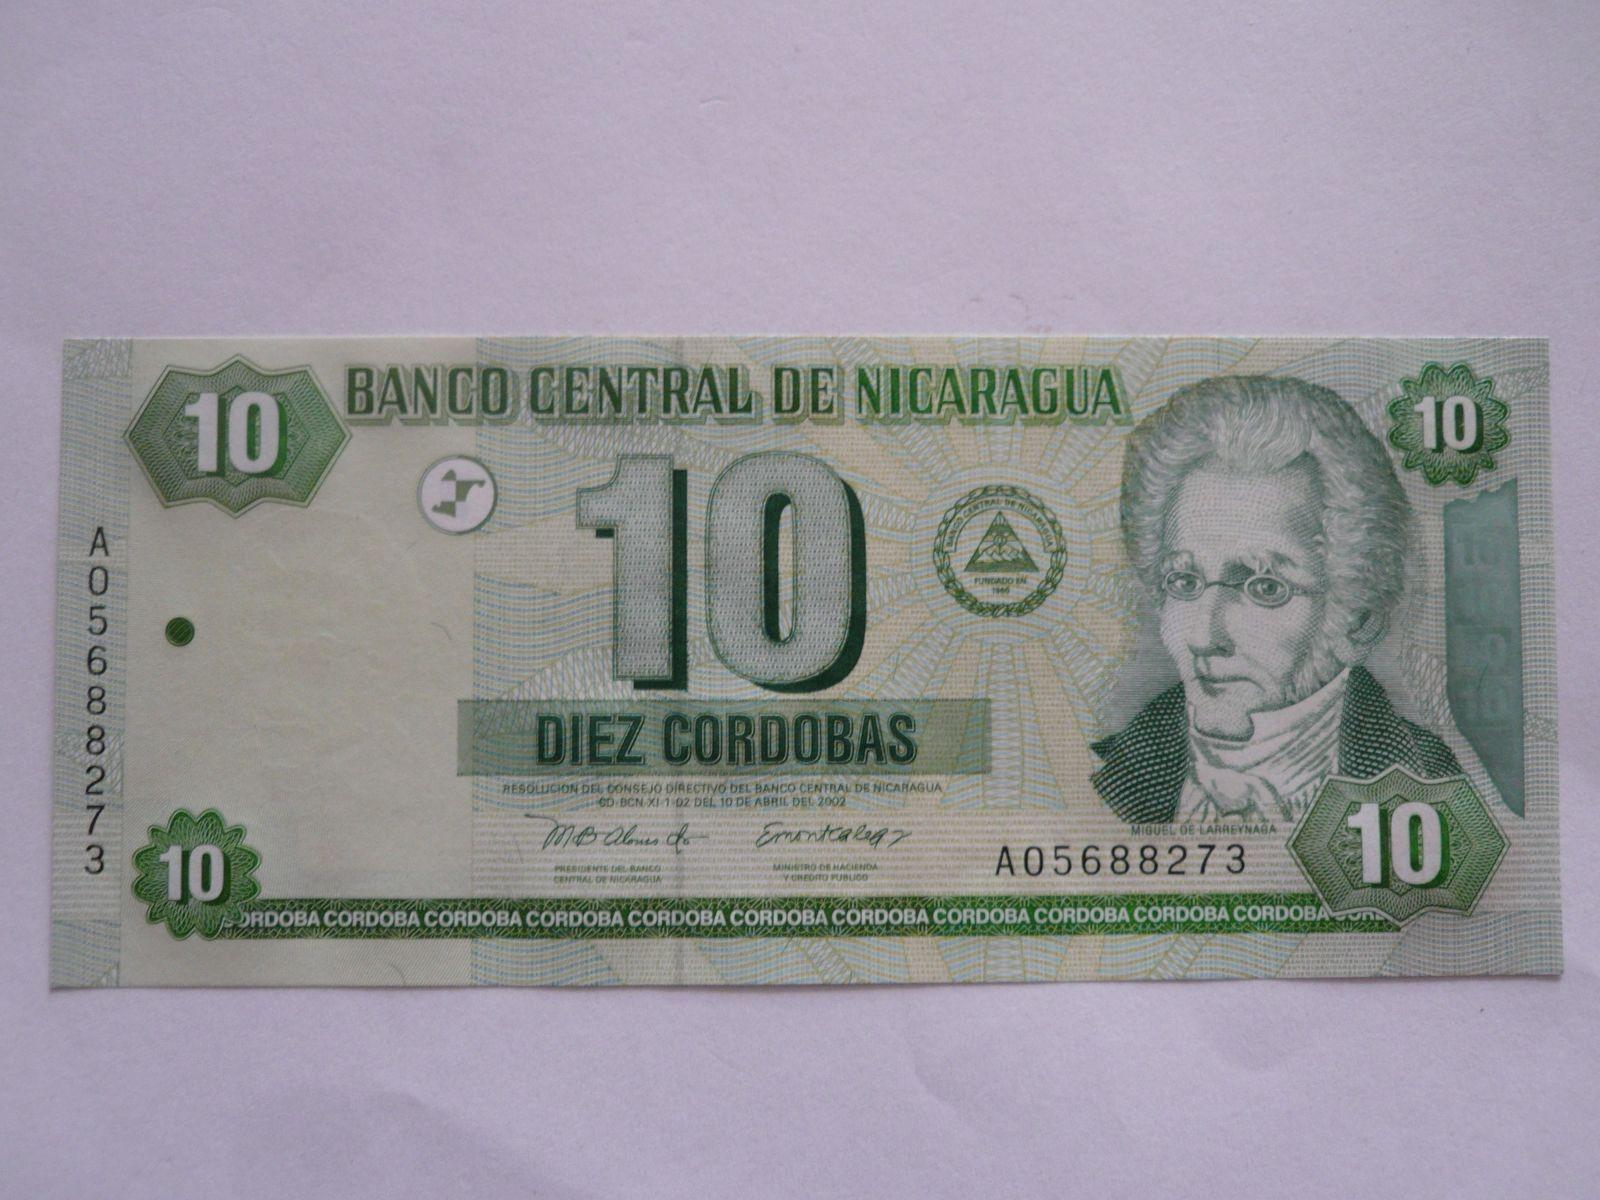 10 Cordobas, Nikaragua, 2002